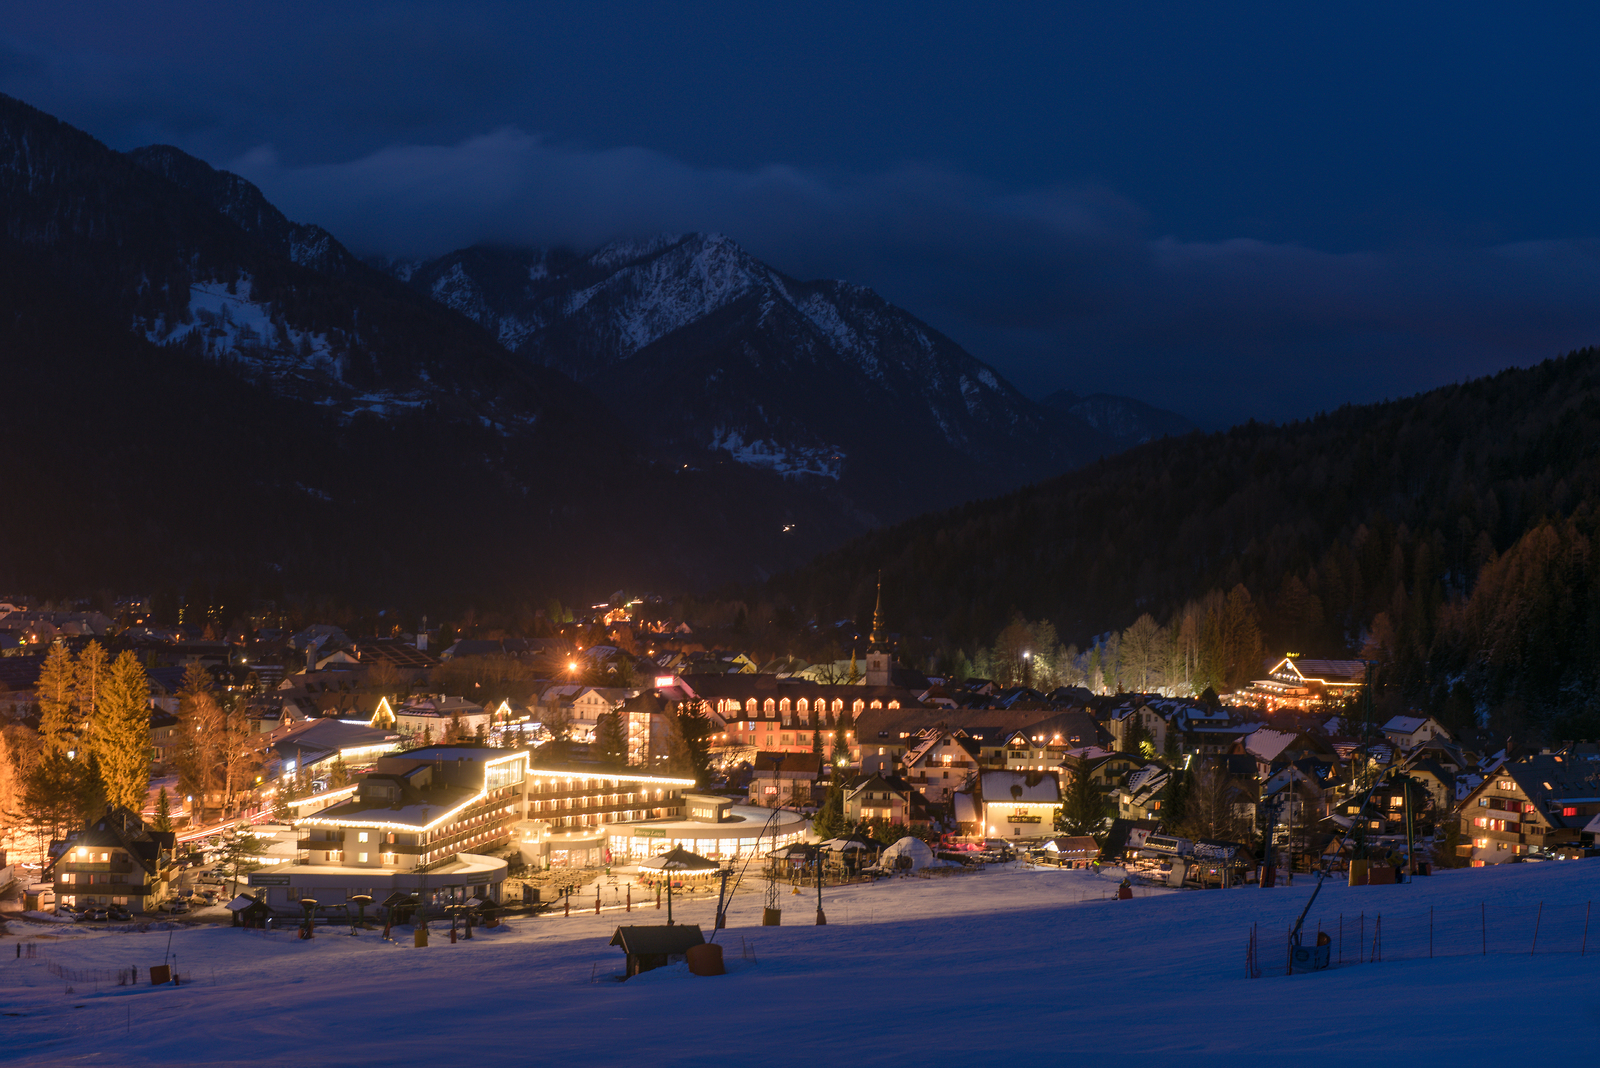 Kranjska-gora-Slovenian-Tourist-Board.